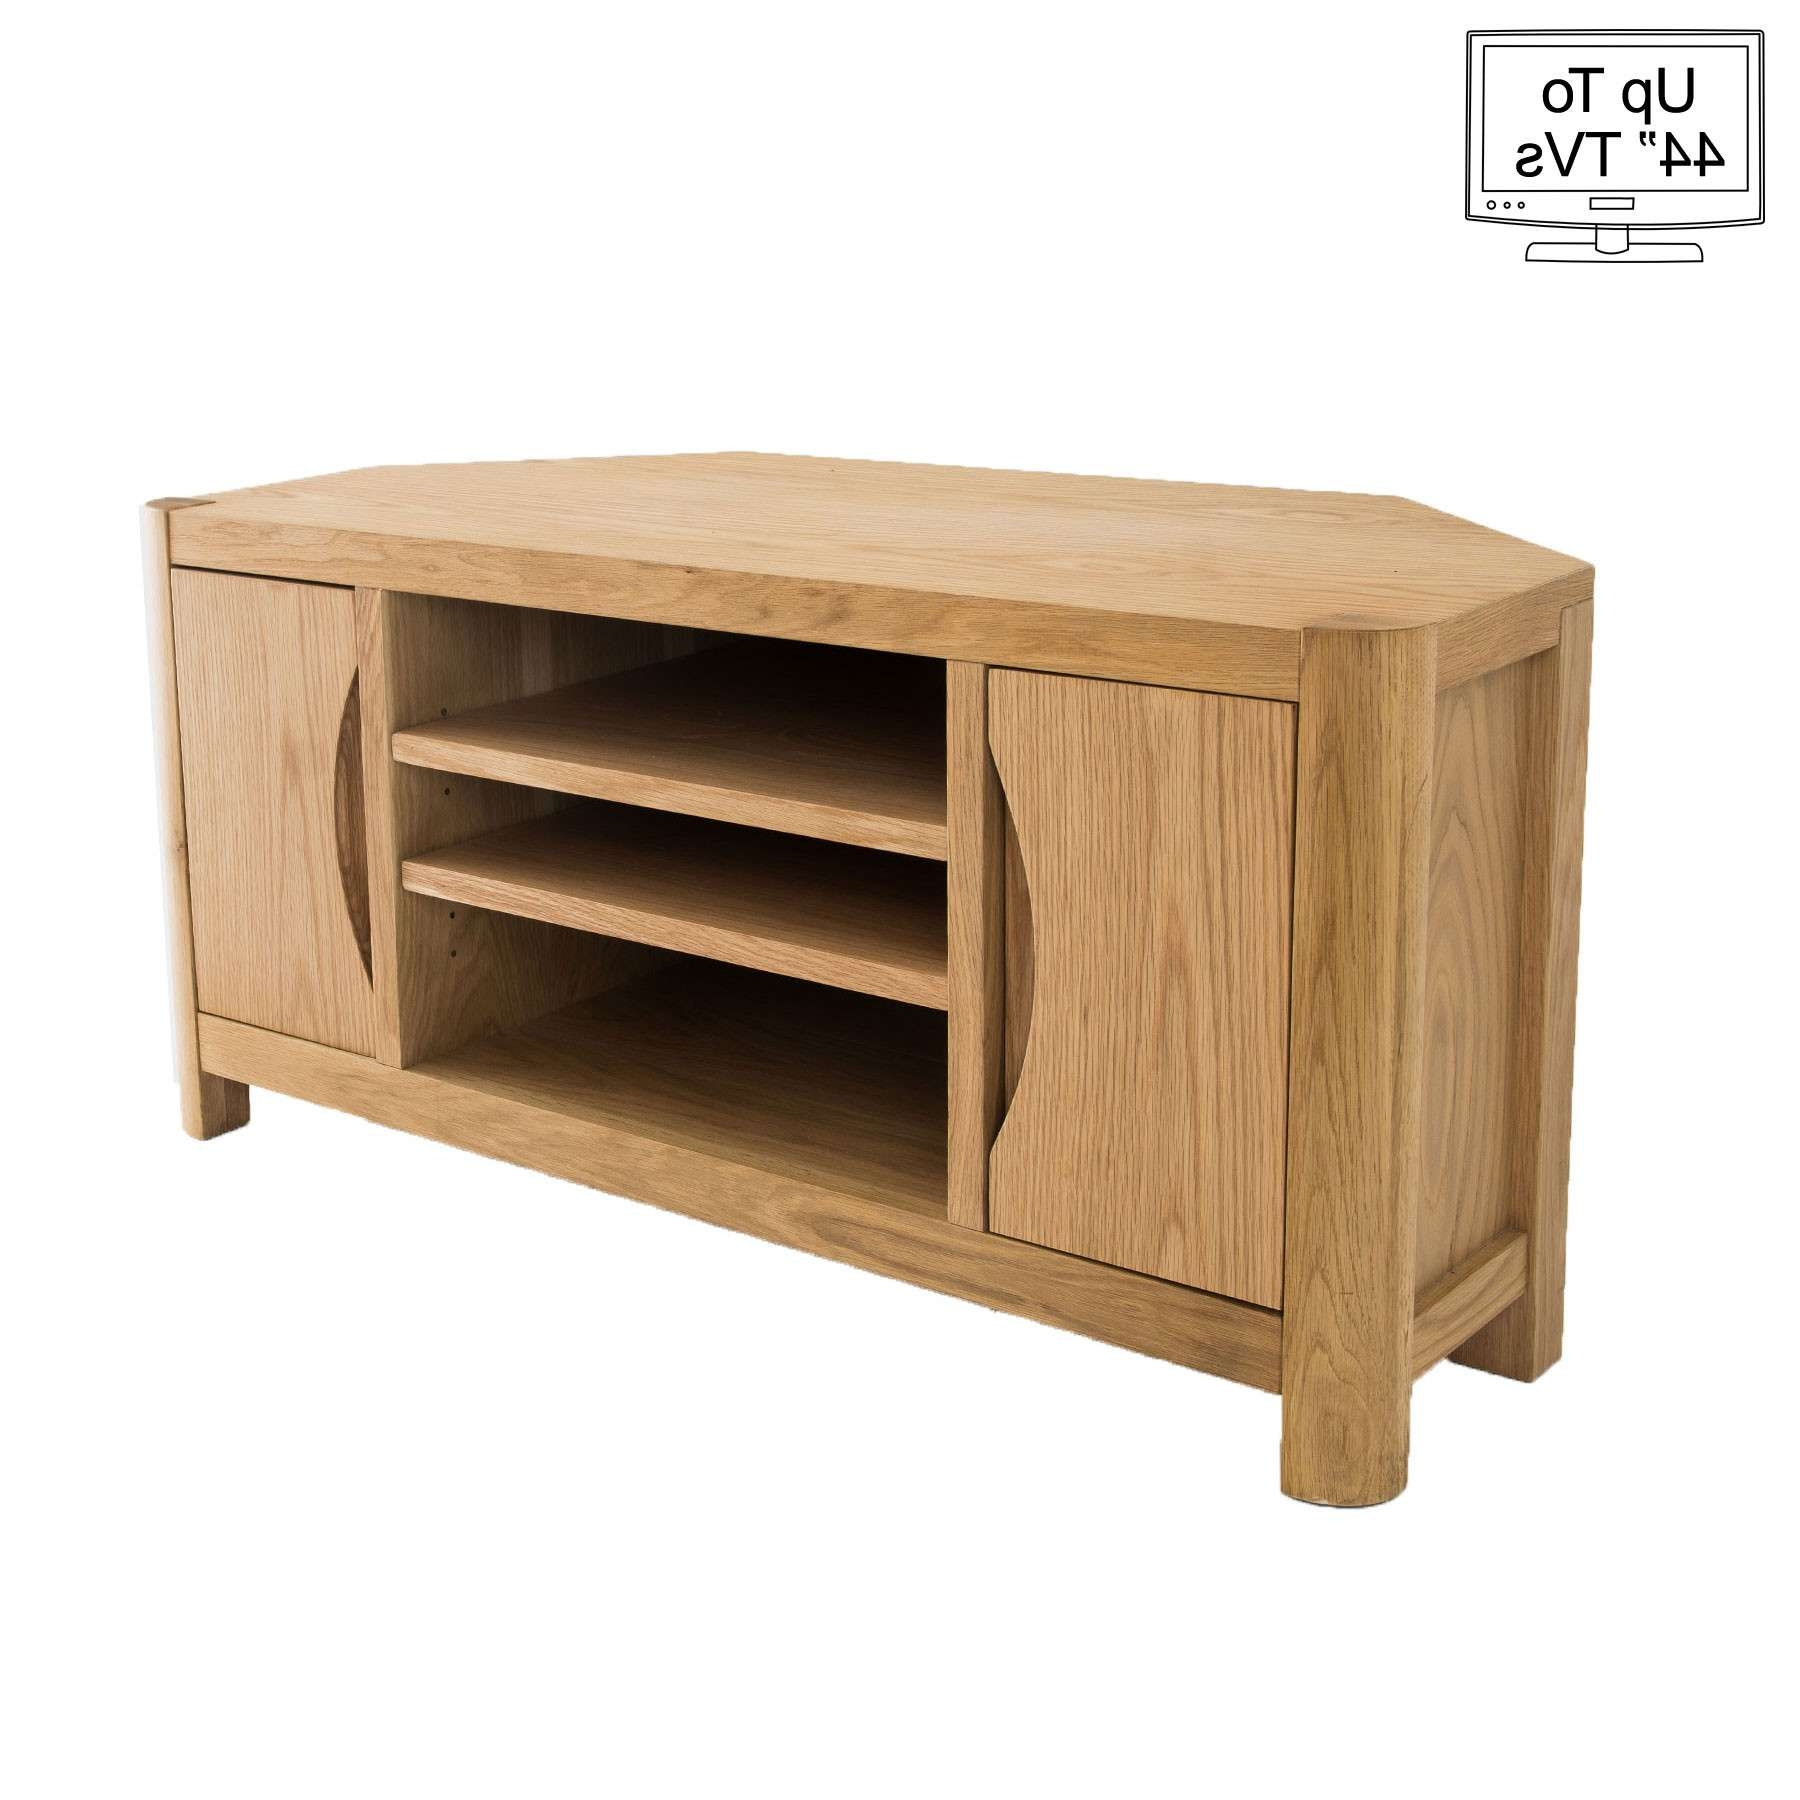 "Light Oak Corner Tv Stand For Up To 44"" Tvs Intended For Light Oak Corner Tv Cabinets (View 2 of 20)"